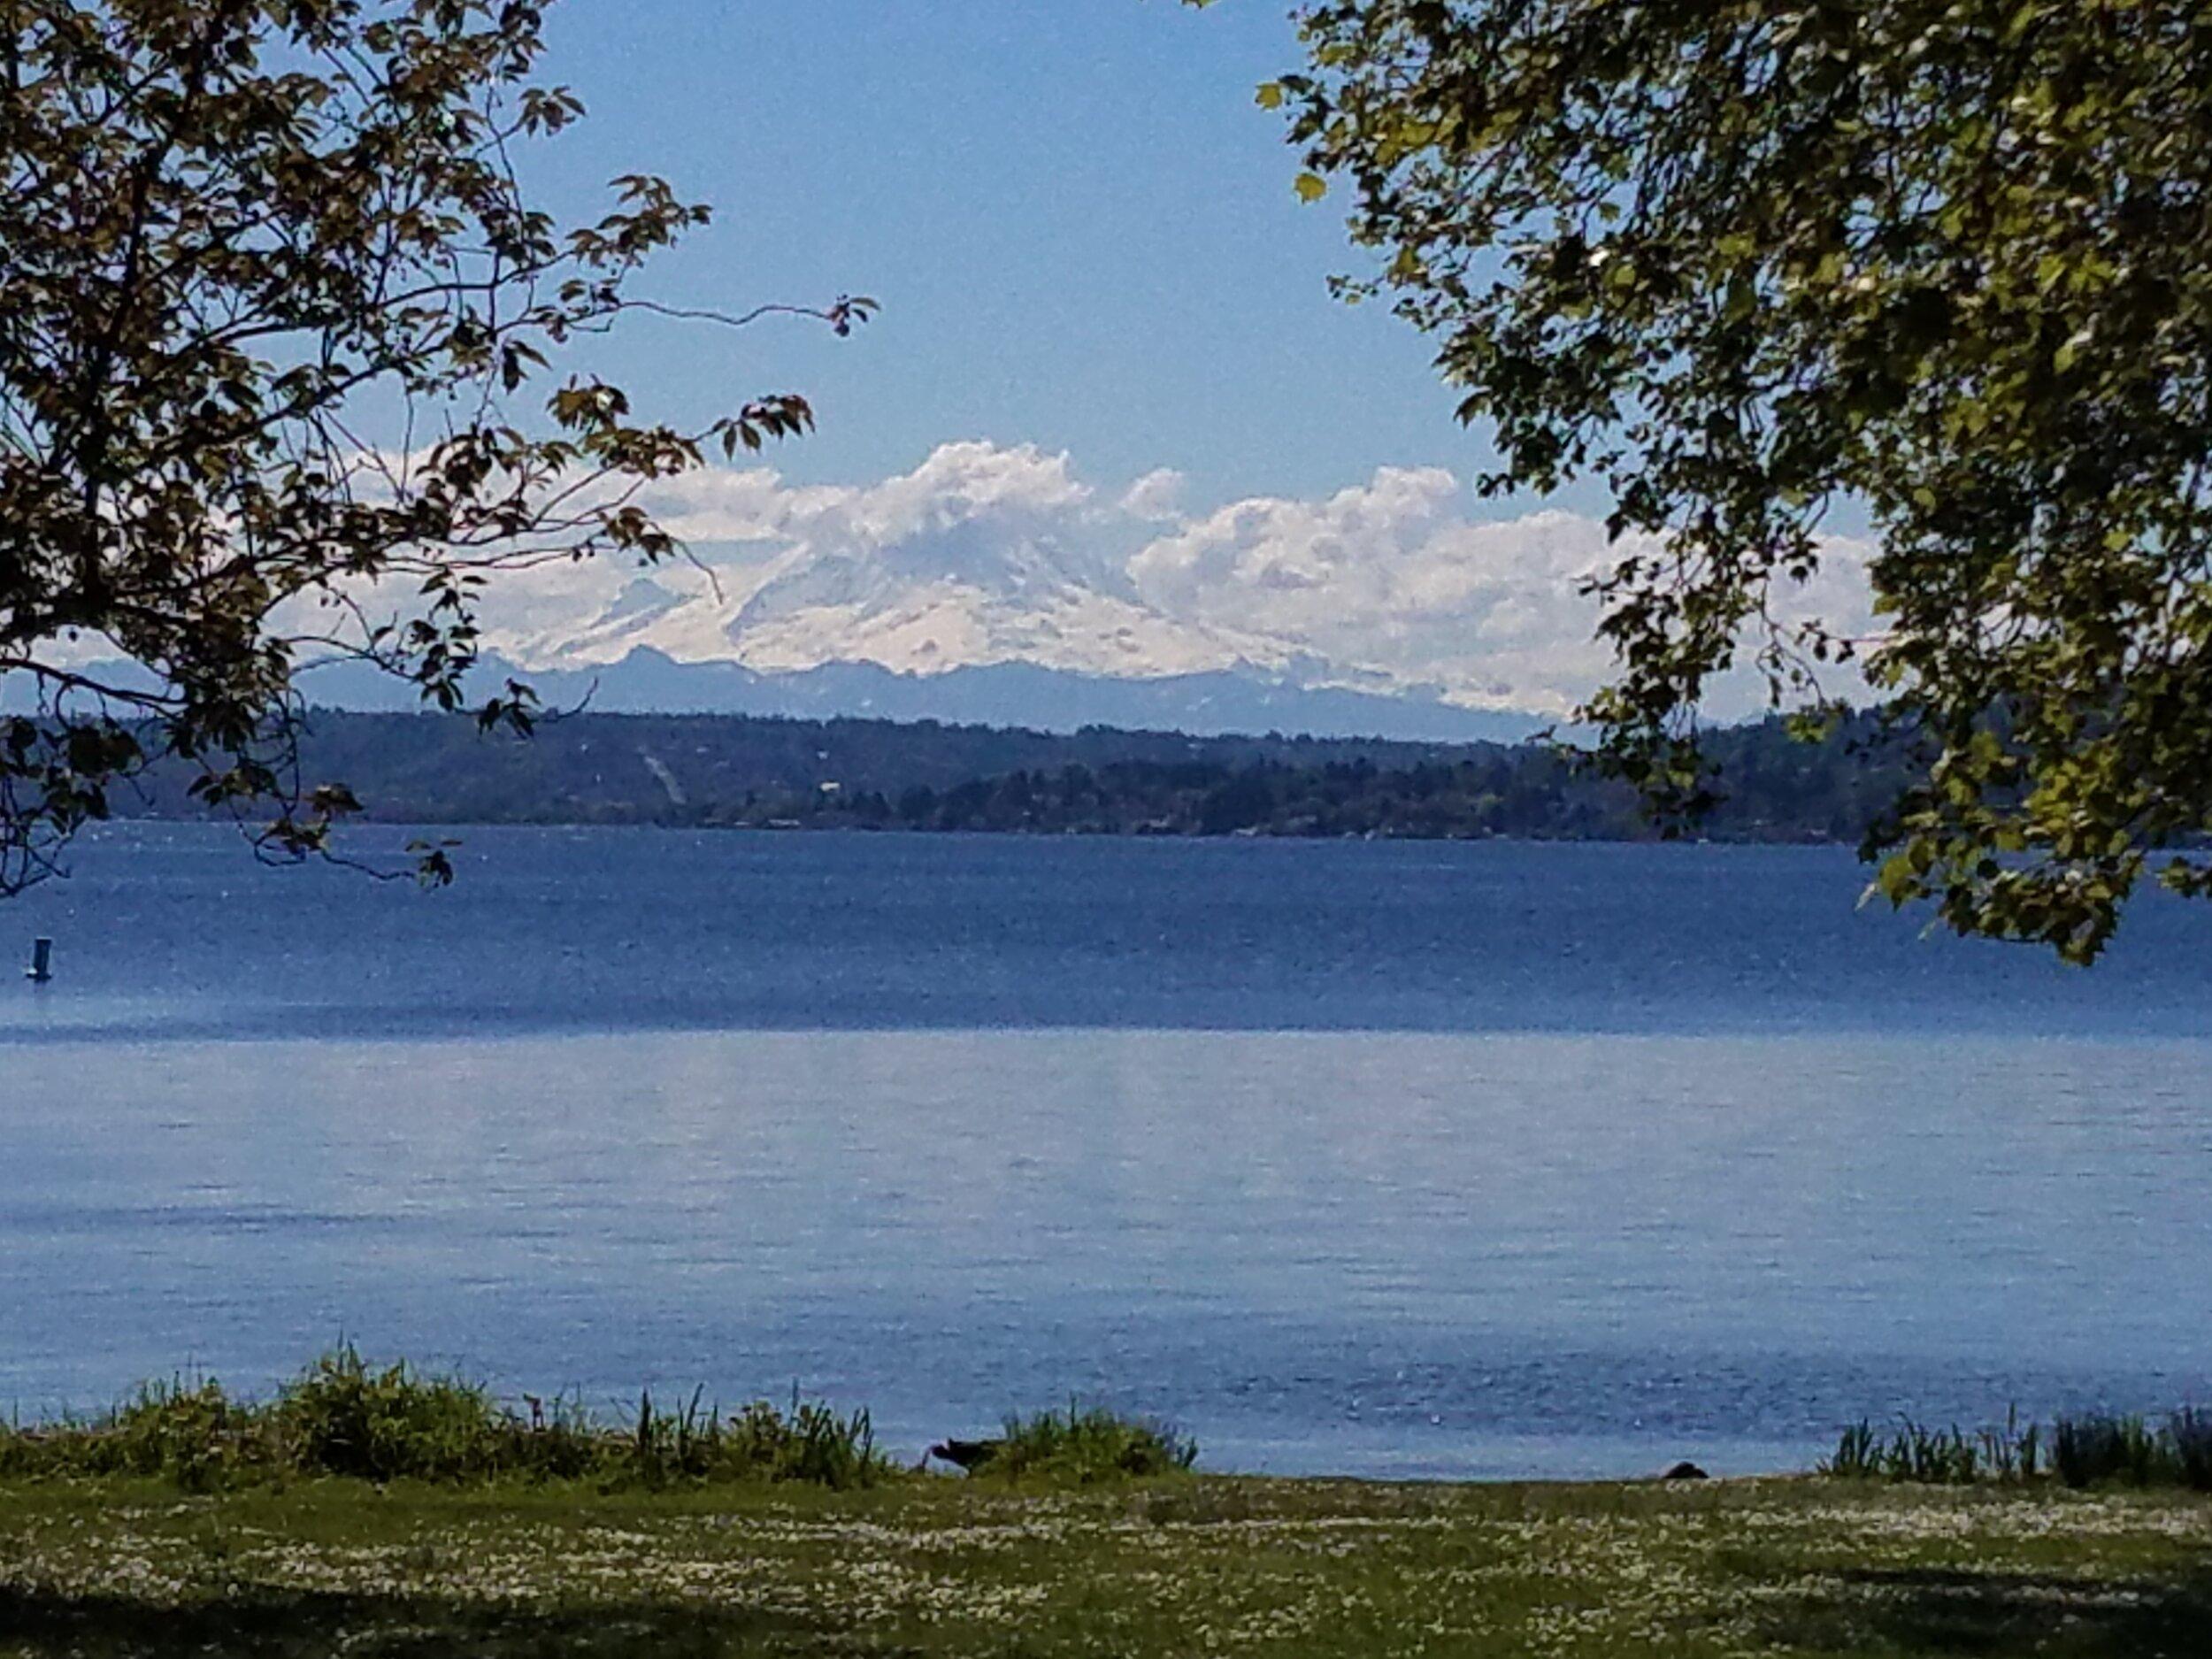 Mt Rainer and Lake Washington from Seward Park